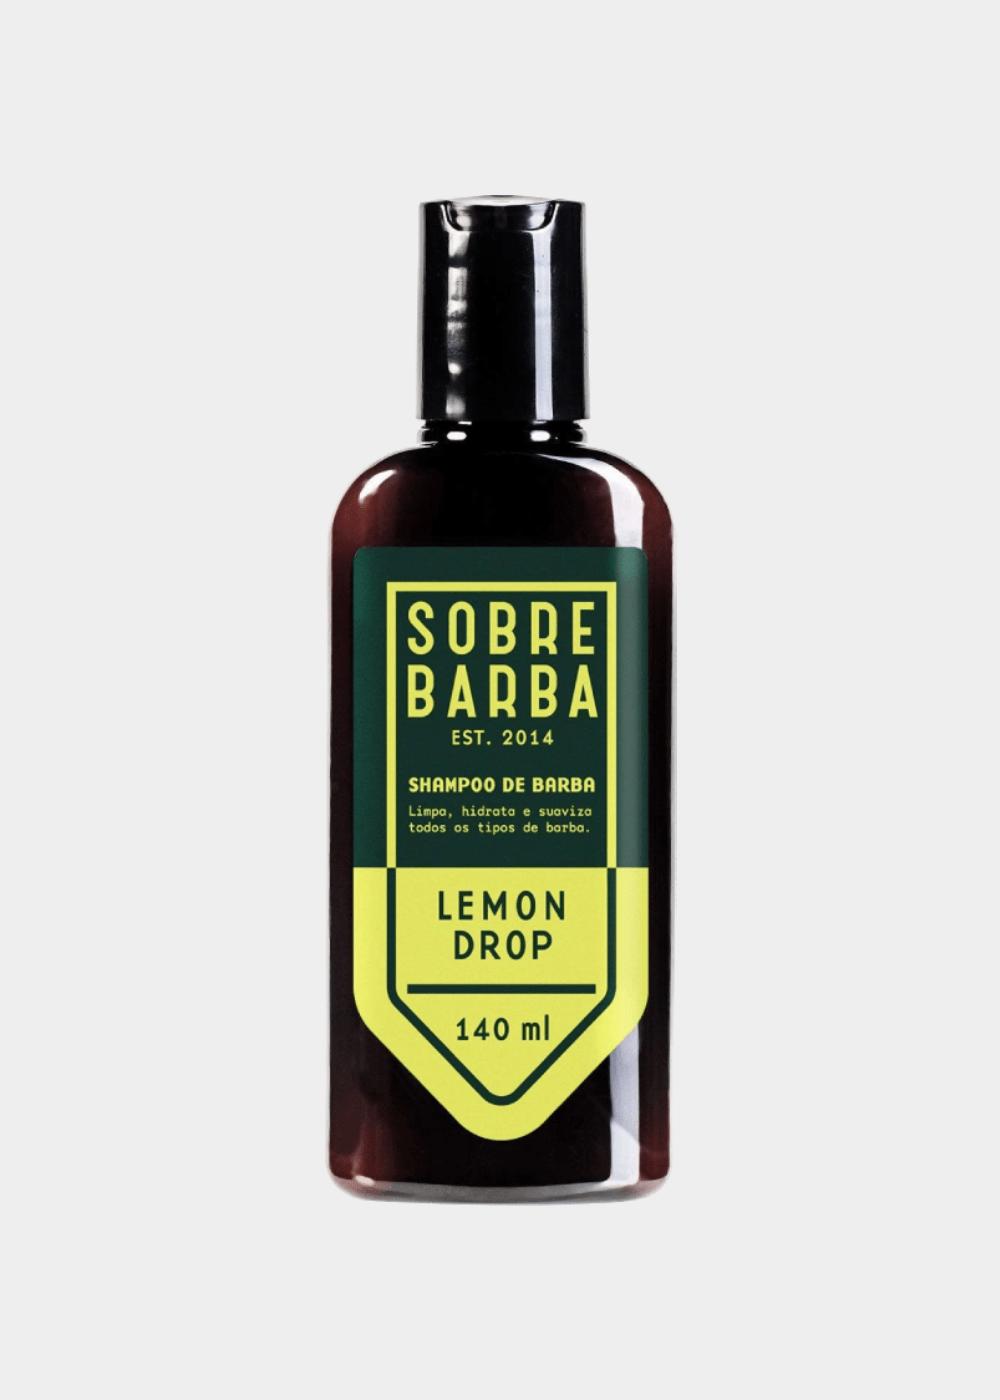 shampoolemondrop